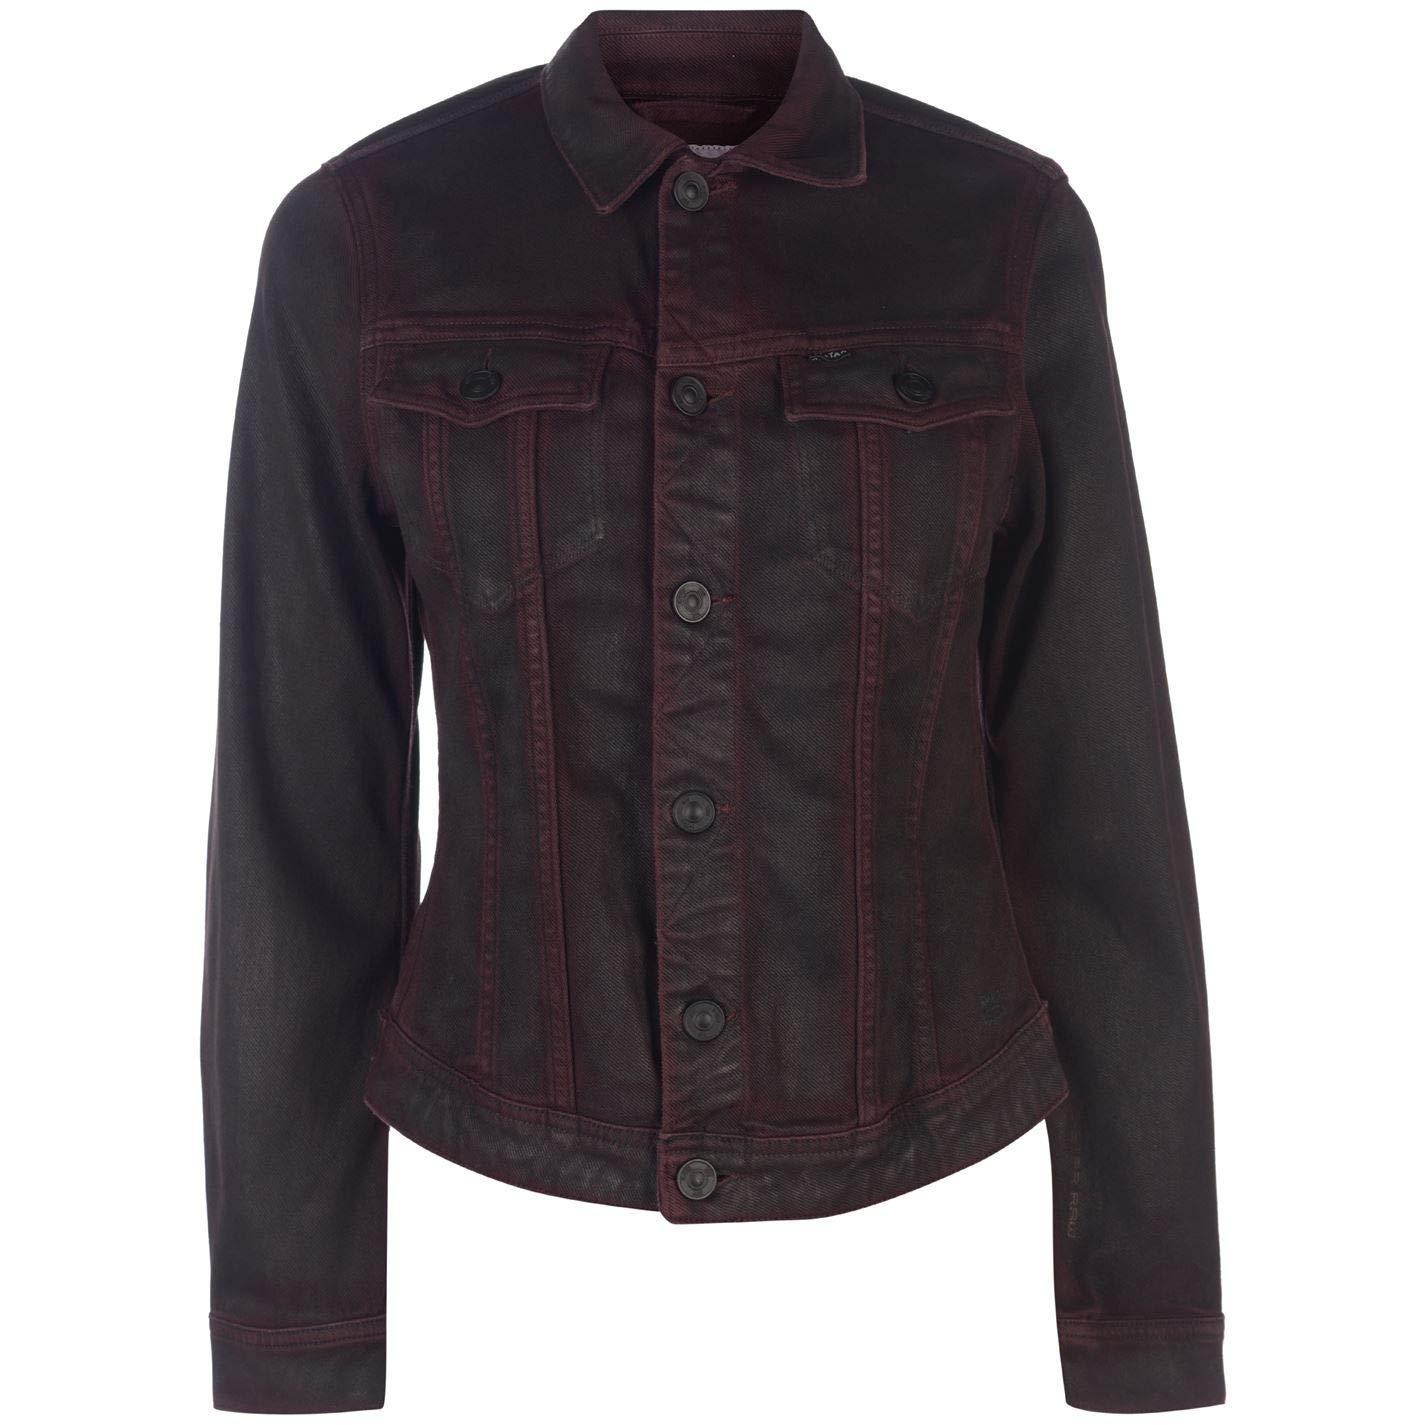 76962796ce2c G Star Mens 92668 Slim Tailor Jacket Maroon S  Amazon.co.uk  Clothing